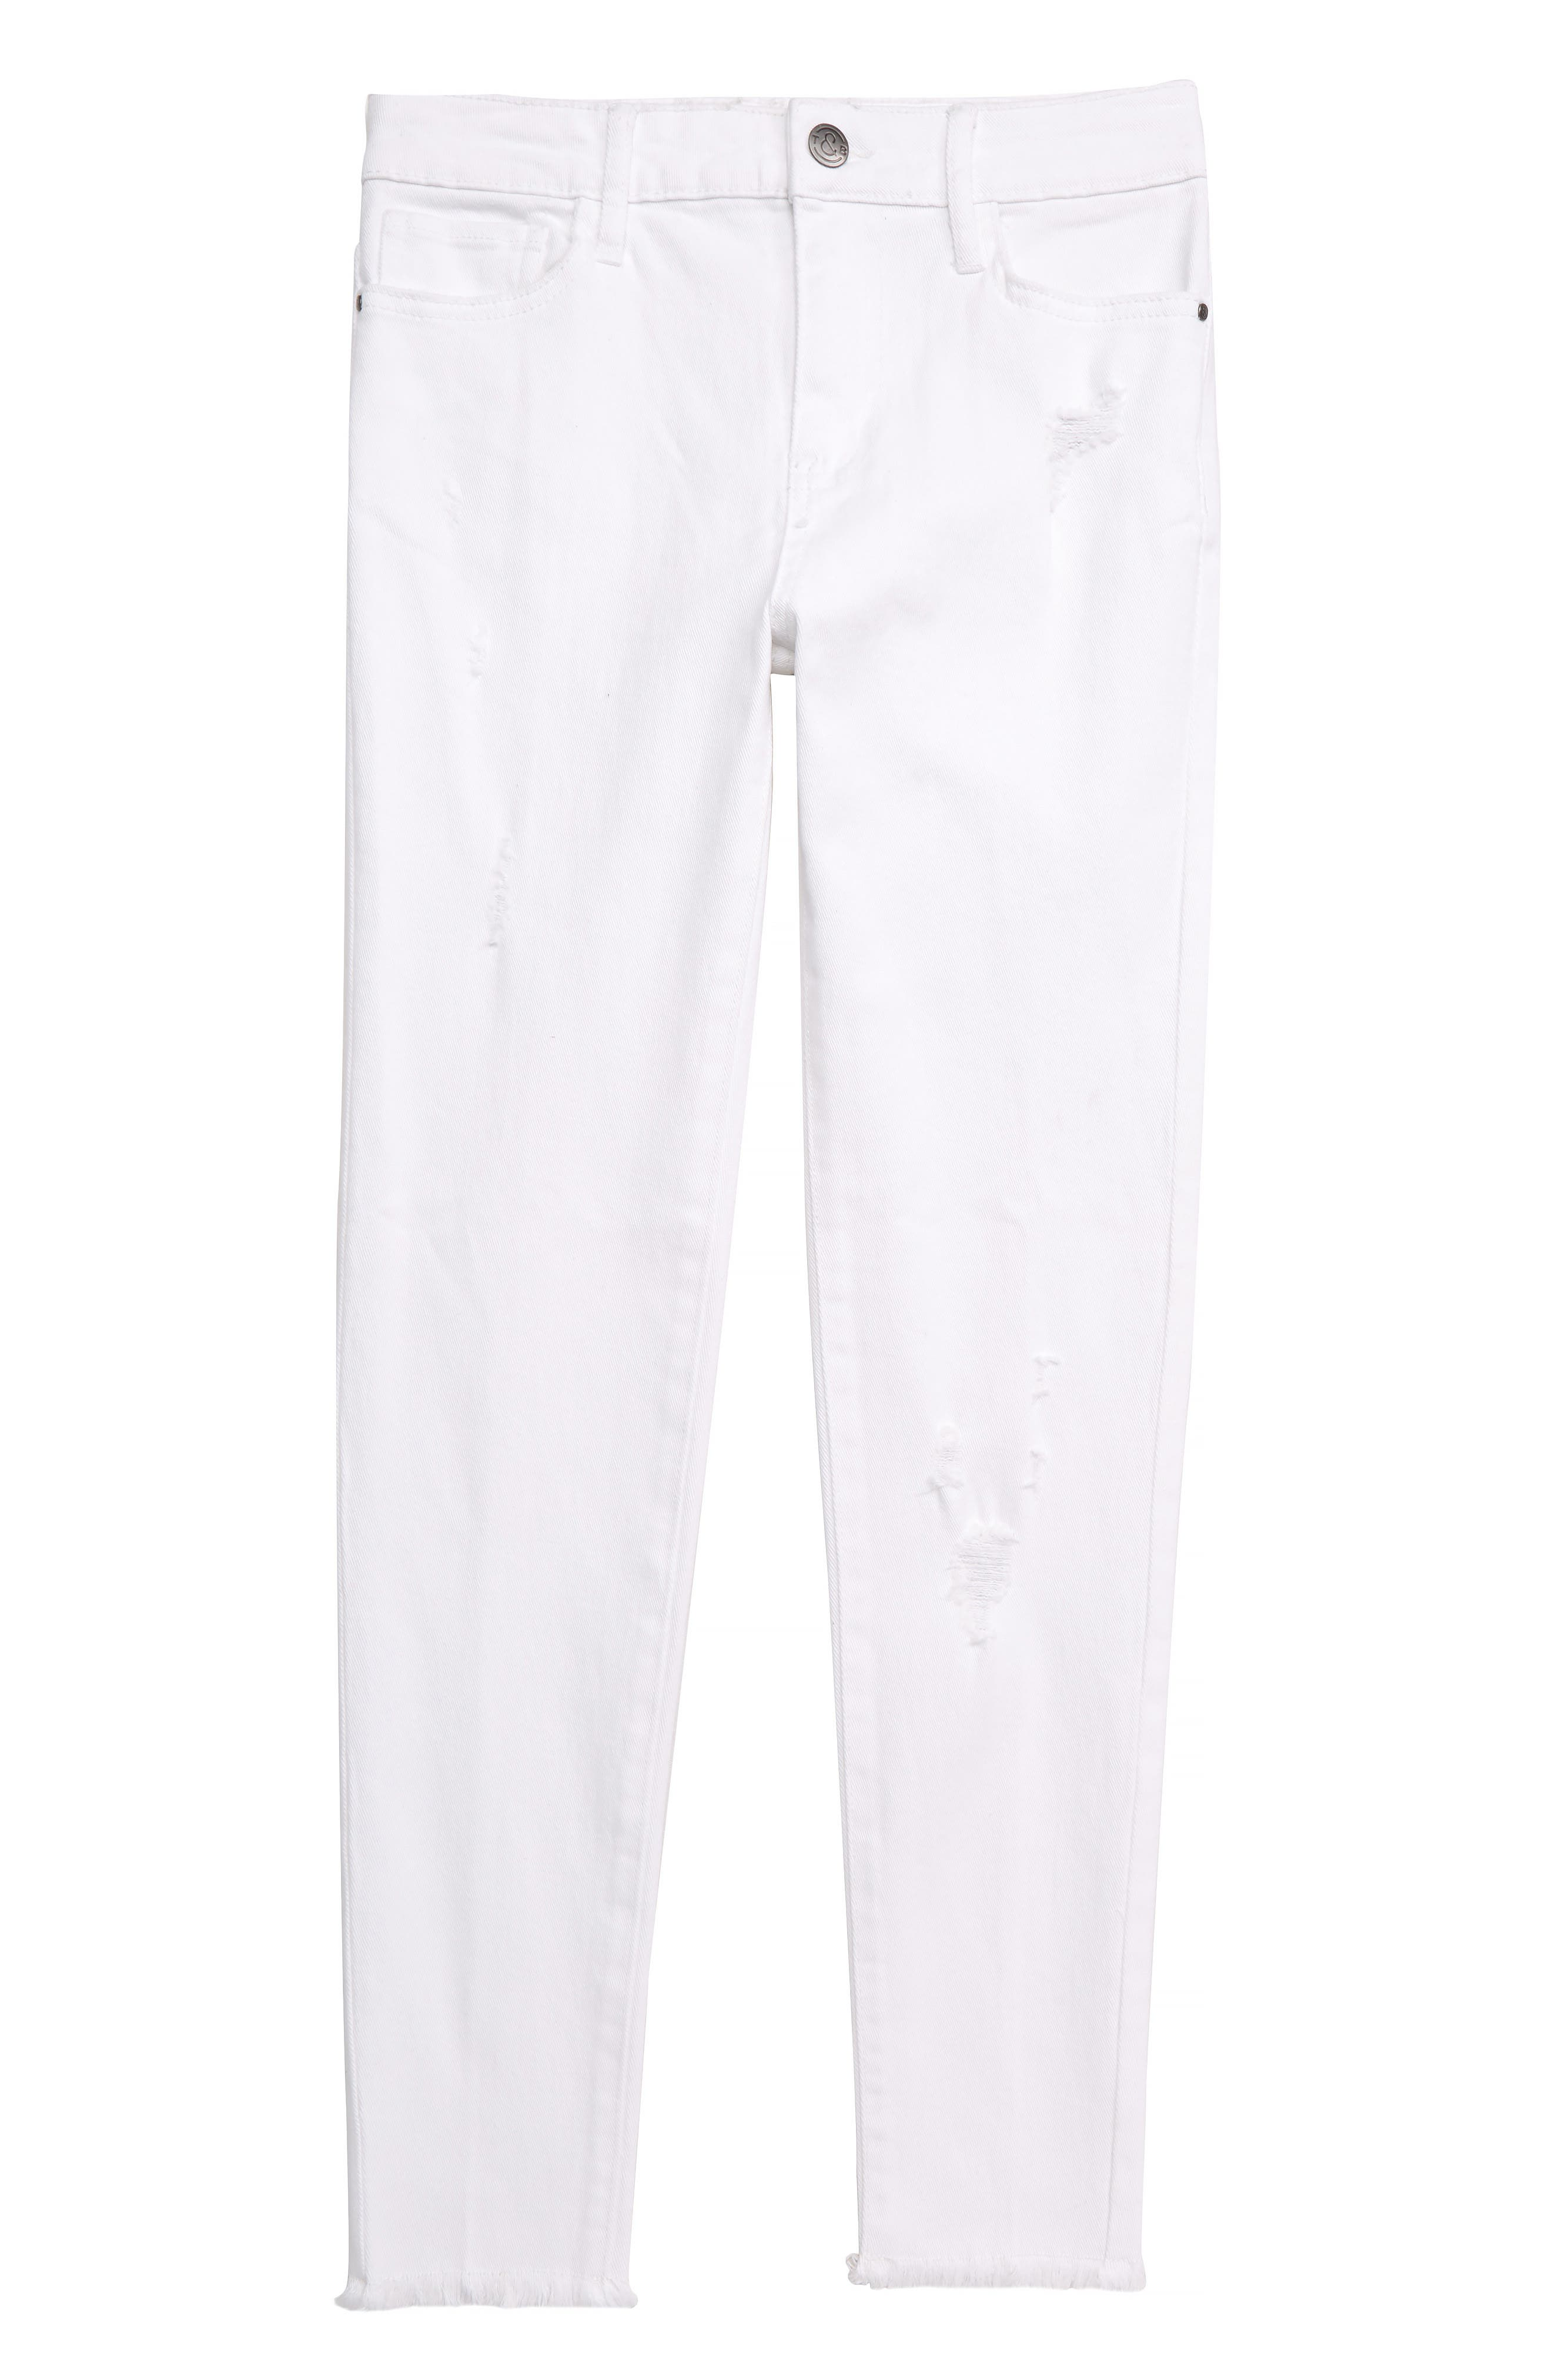 TREASURE & BOND Distressed Skinny Jeans, Main, color, WHITE